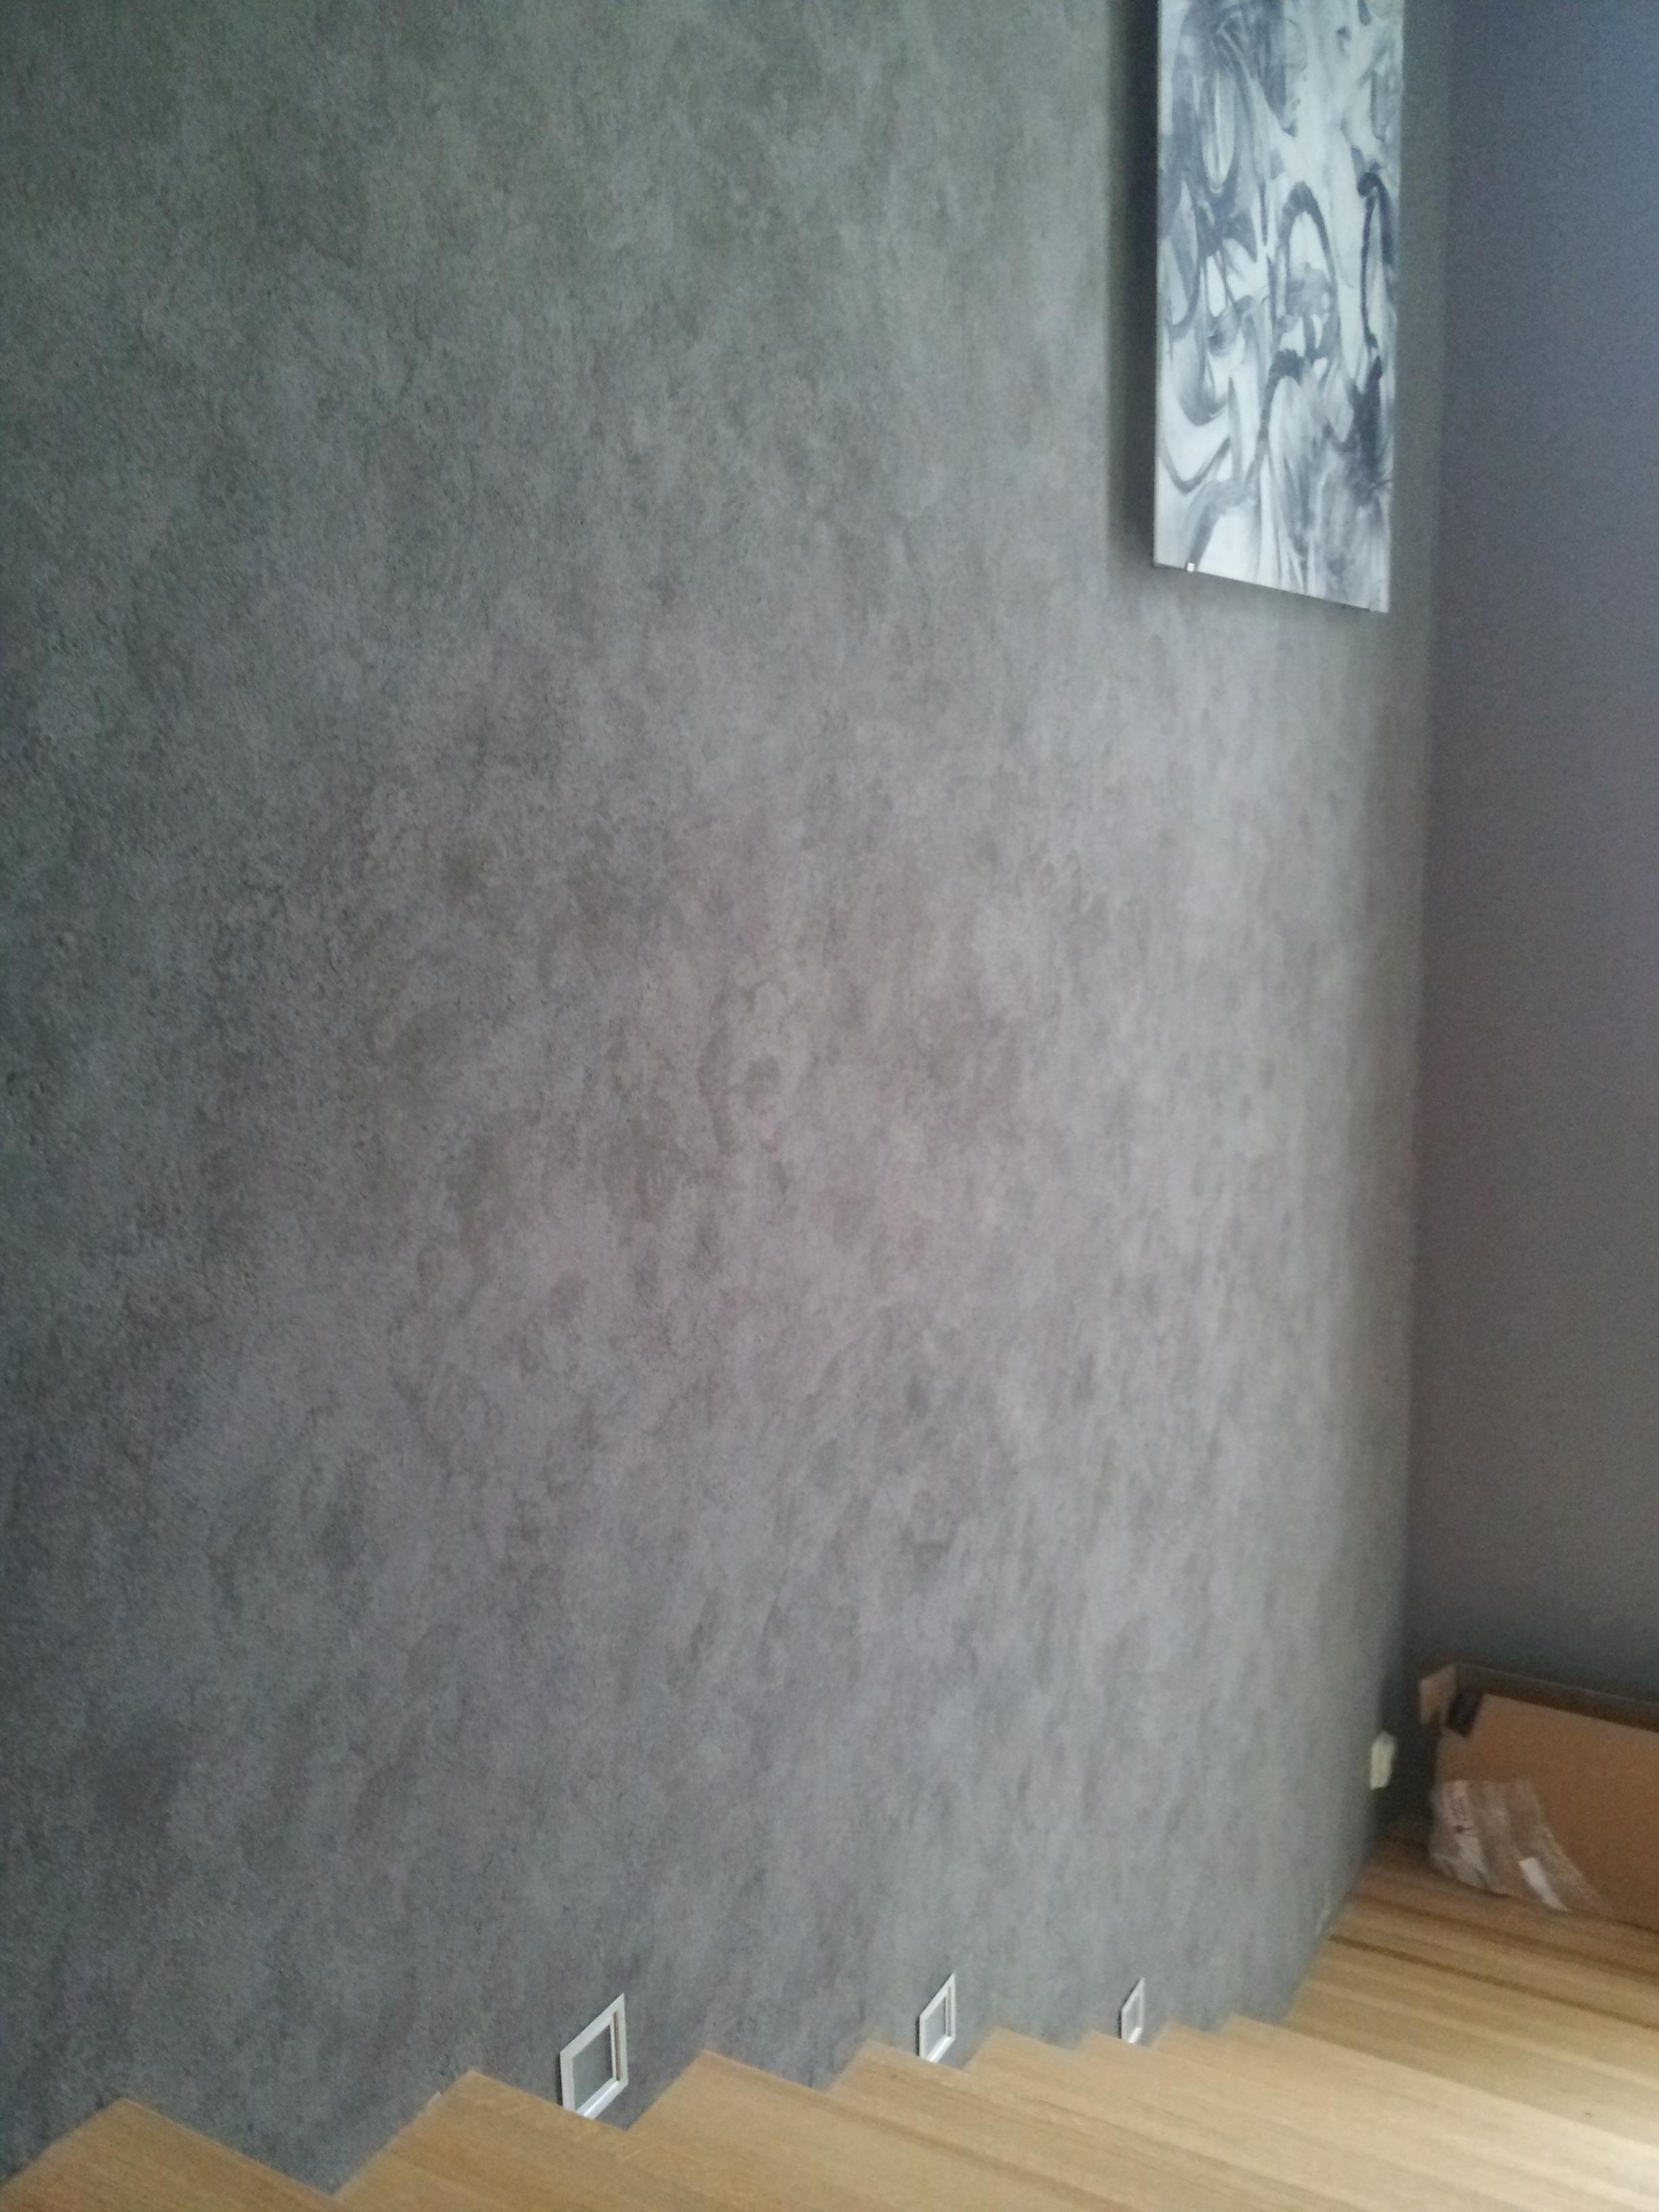 Claystone sisustuslaasti portaikko